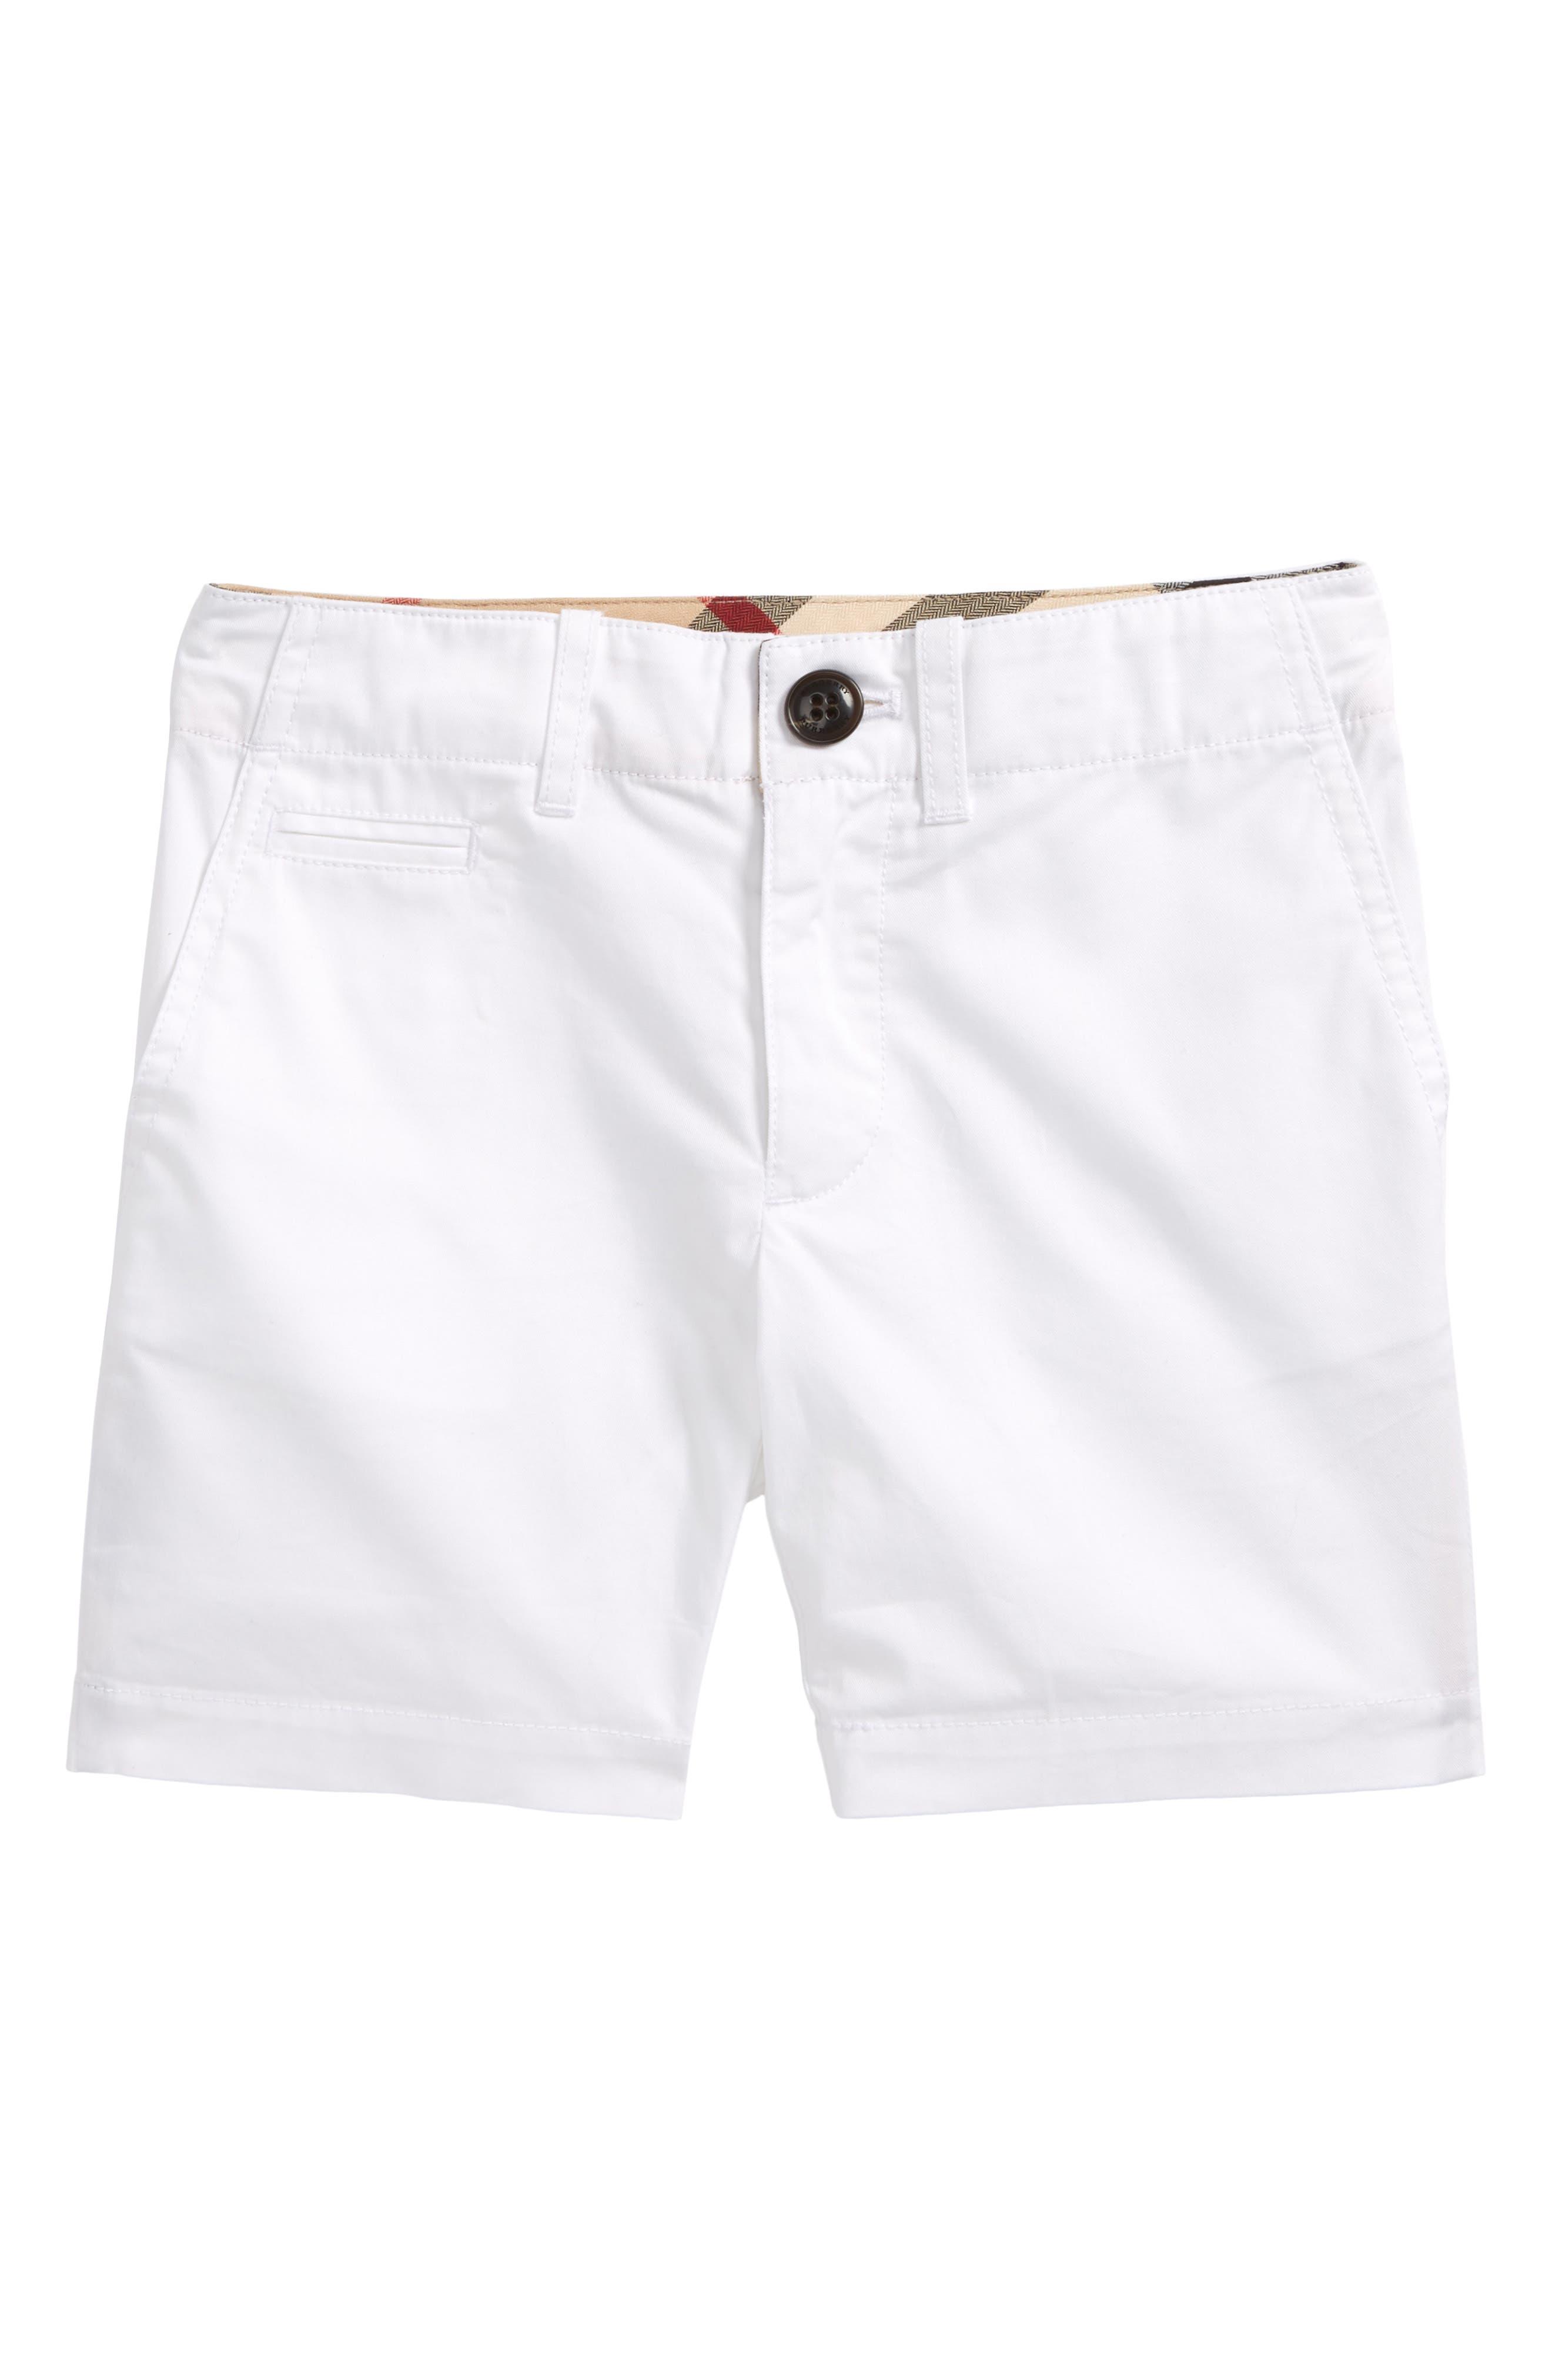 Tina Cotton Twill Shorts,                             Main thumbnail 1, color,                             White